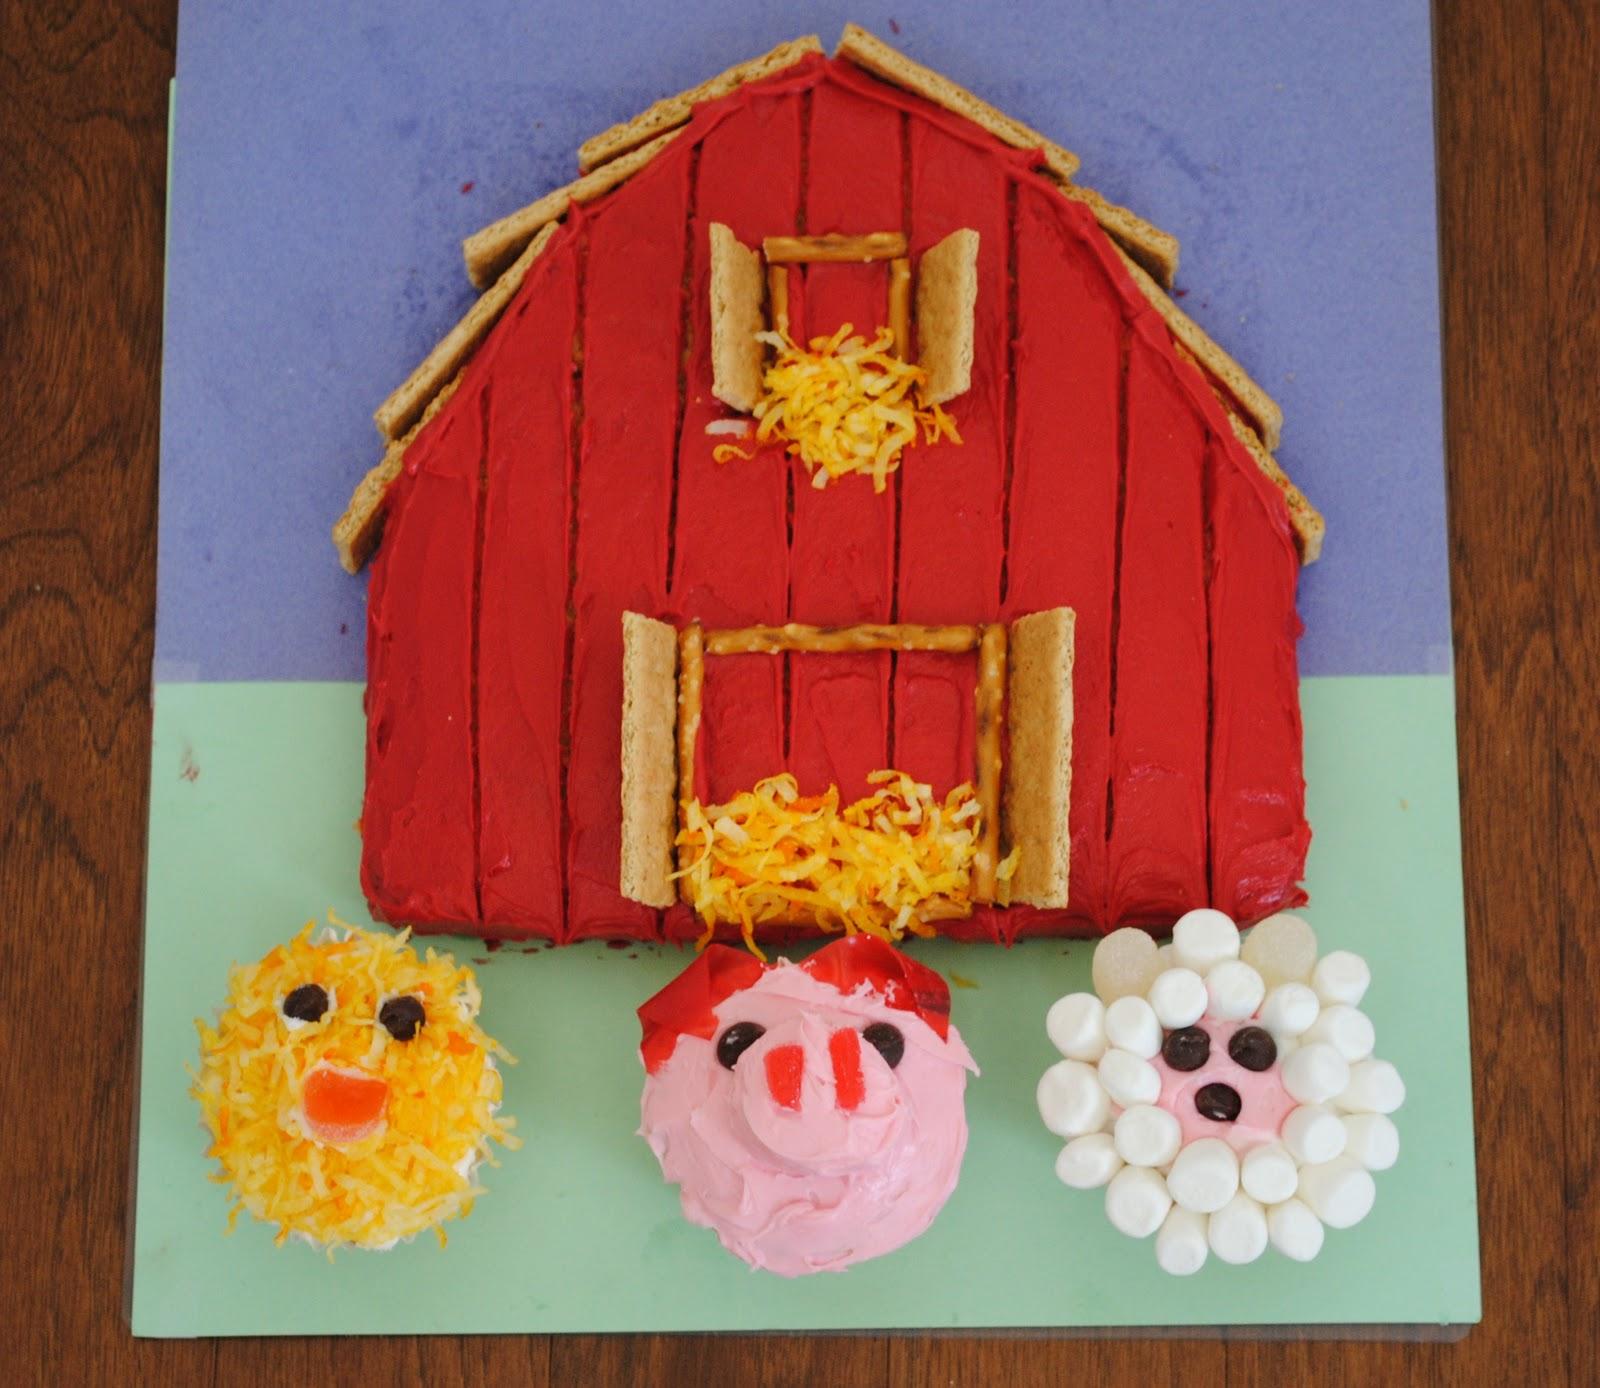 Calico and Cupcakes: Barnyard Birthday Bash